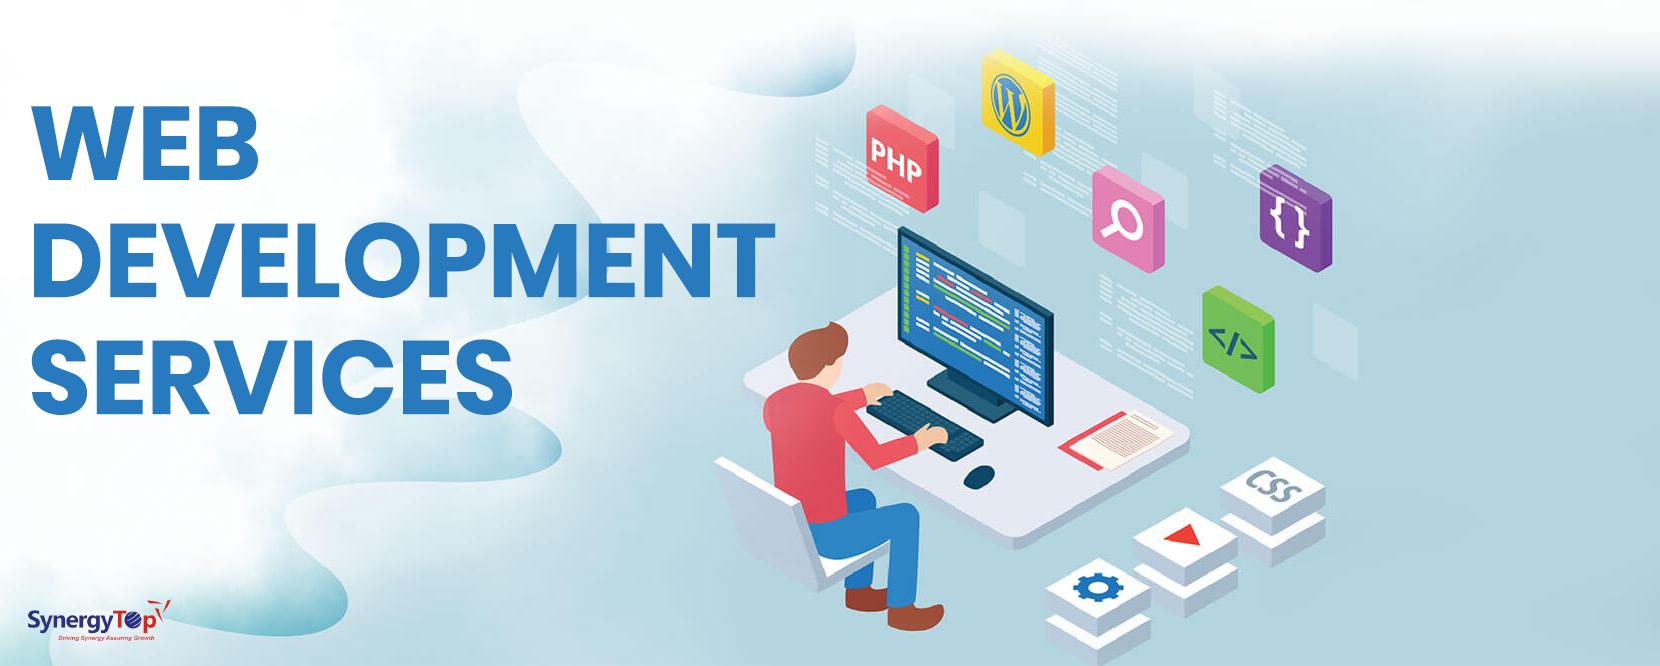 Synergytop Top Web Development Company In San Diego Ca In 2020 Web Development Development Web Development Company